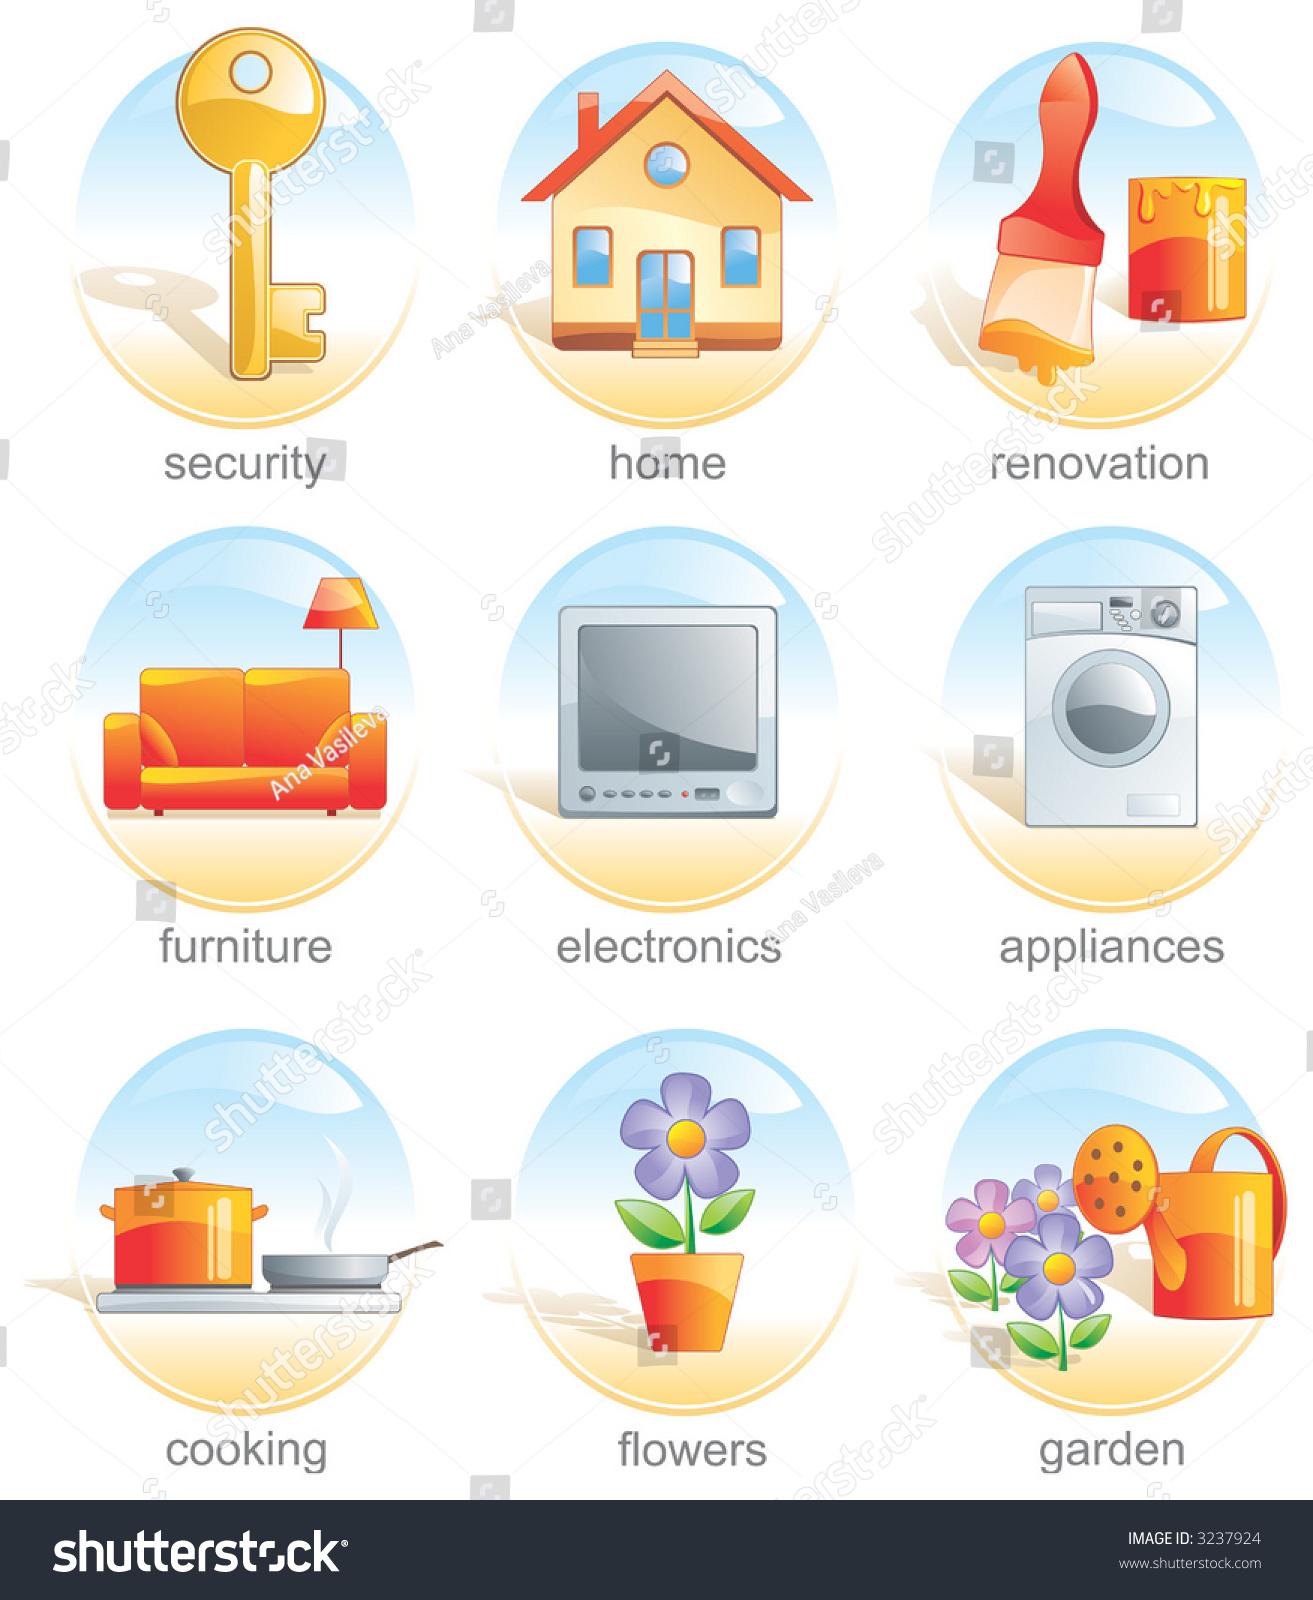 icon set home key renovate furniture electronics appliance cook